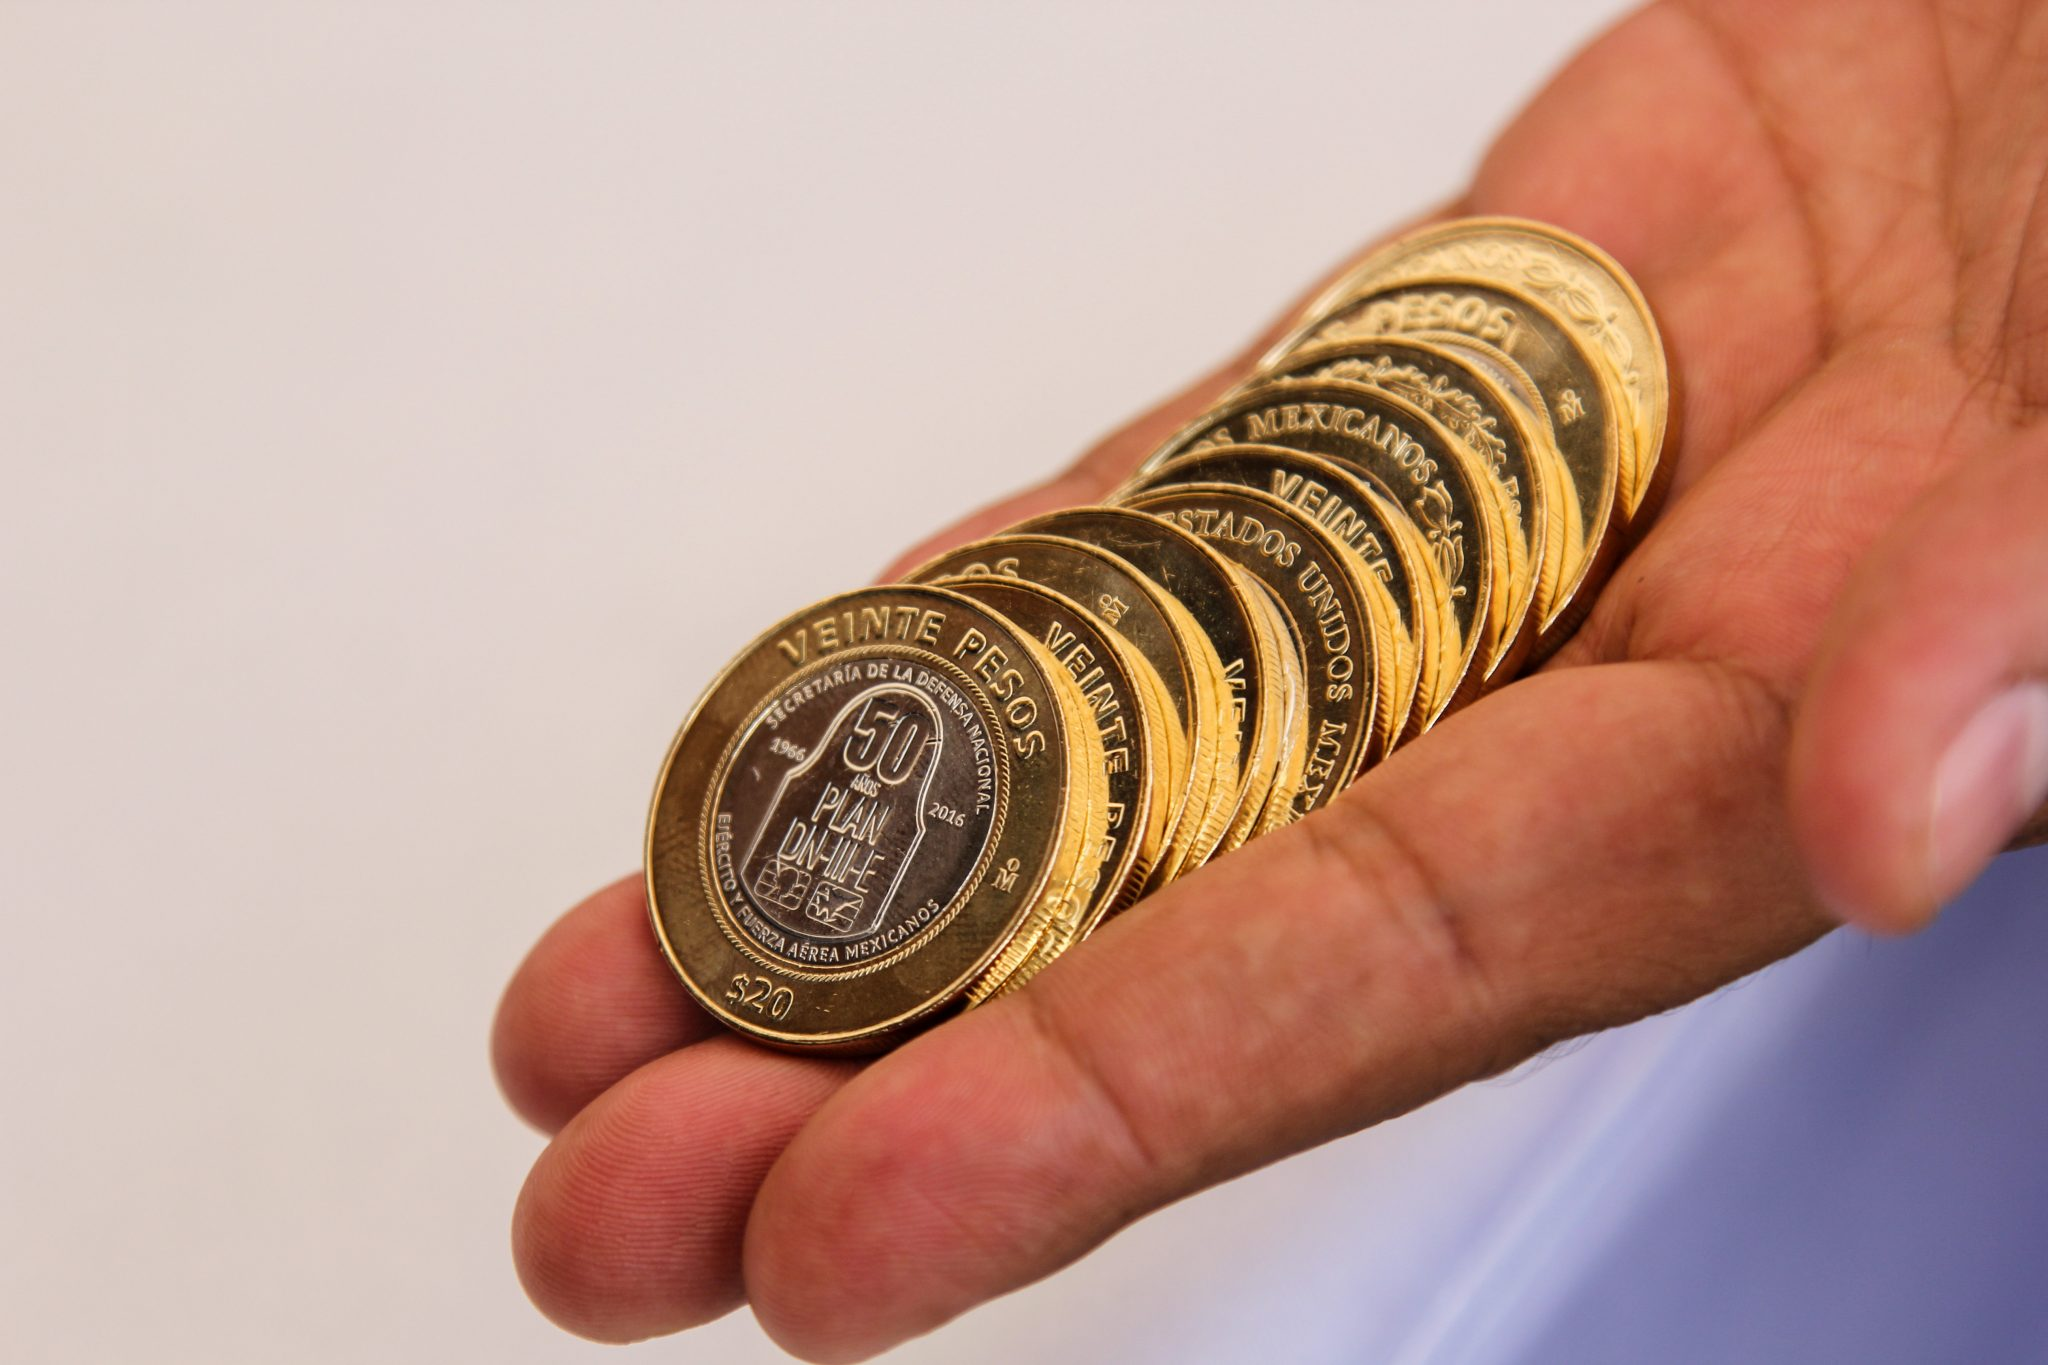 El cuento de las 100 monedas - El cuento de las 100 monedas